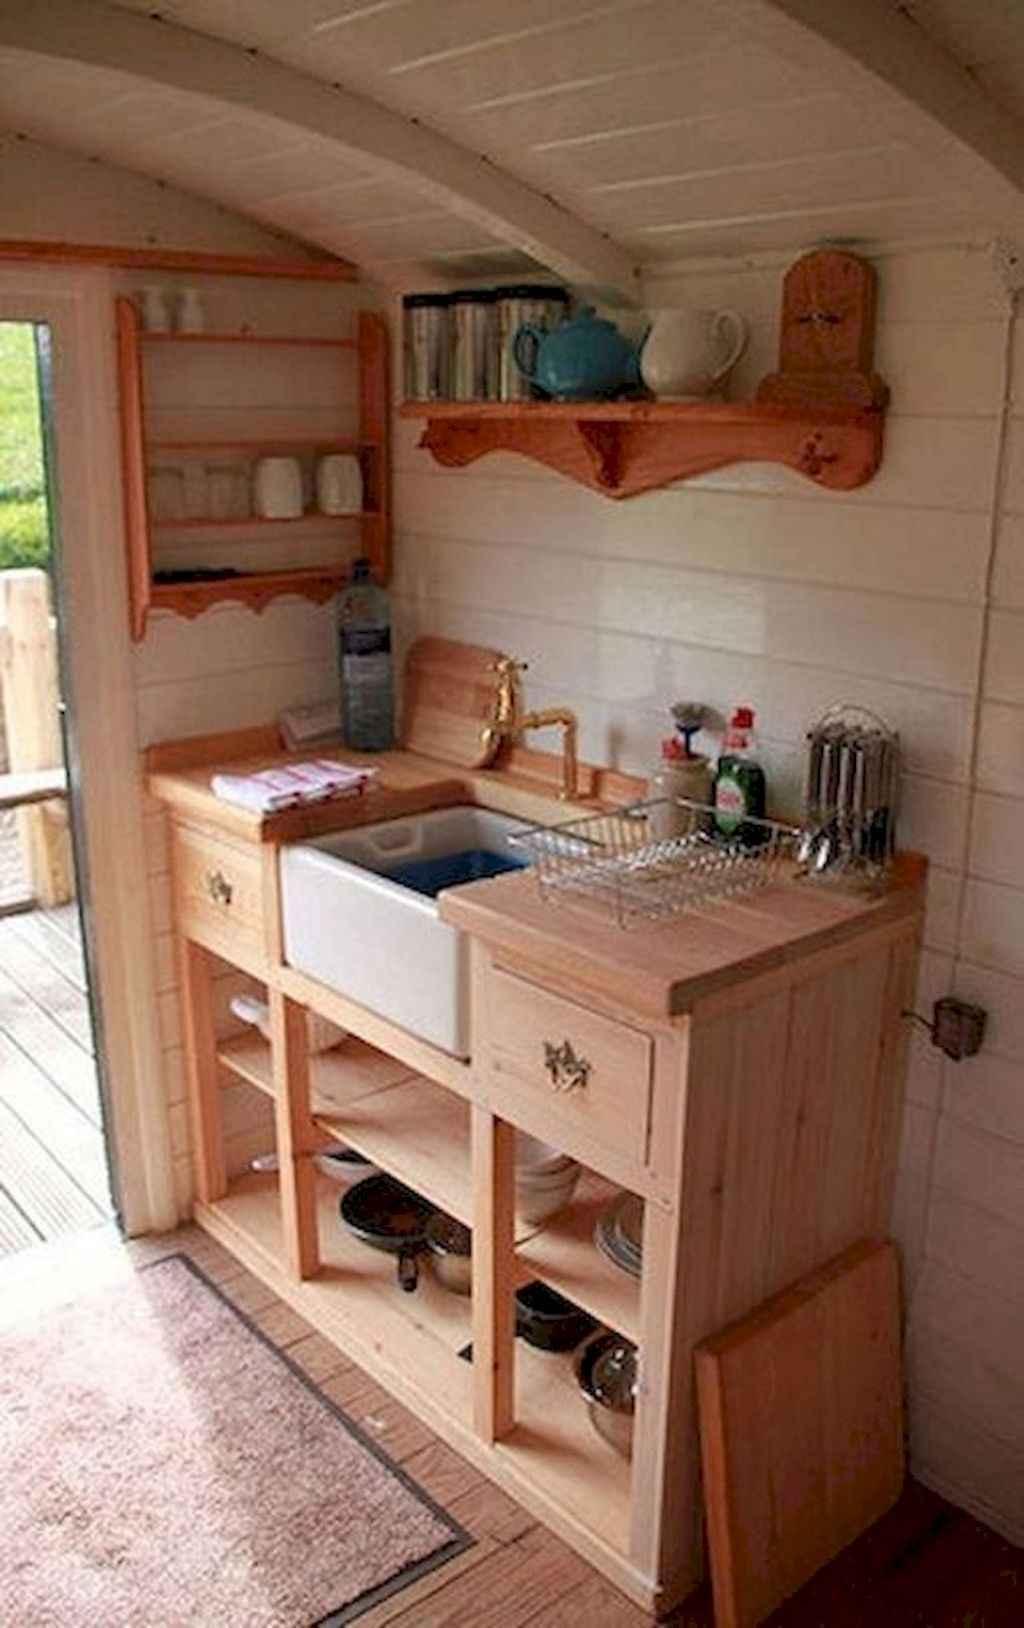 19 Tiny House Kitchen Storage Organization and Tips Ideas